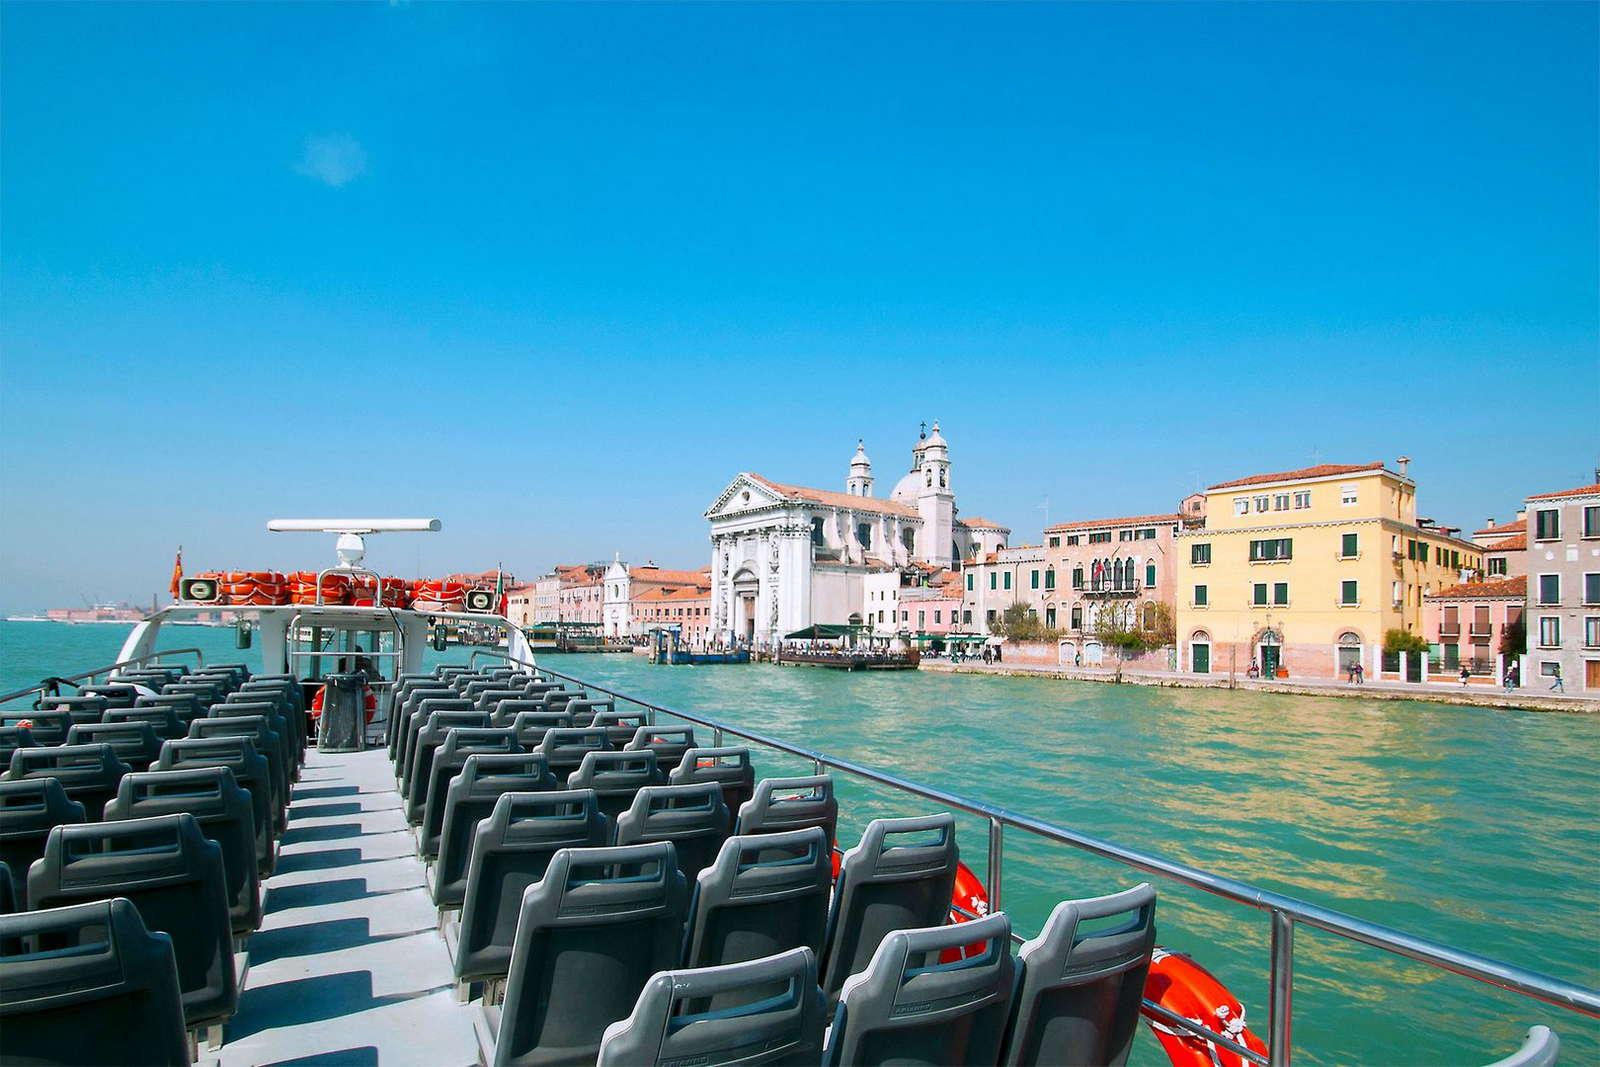 Direkt mit Venedig verbunden